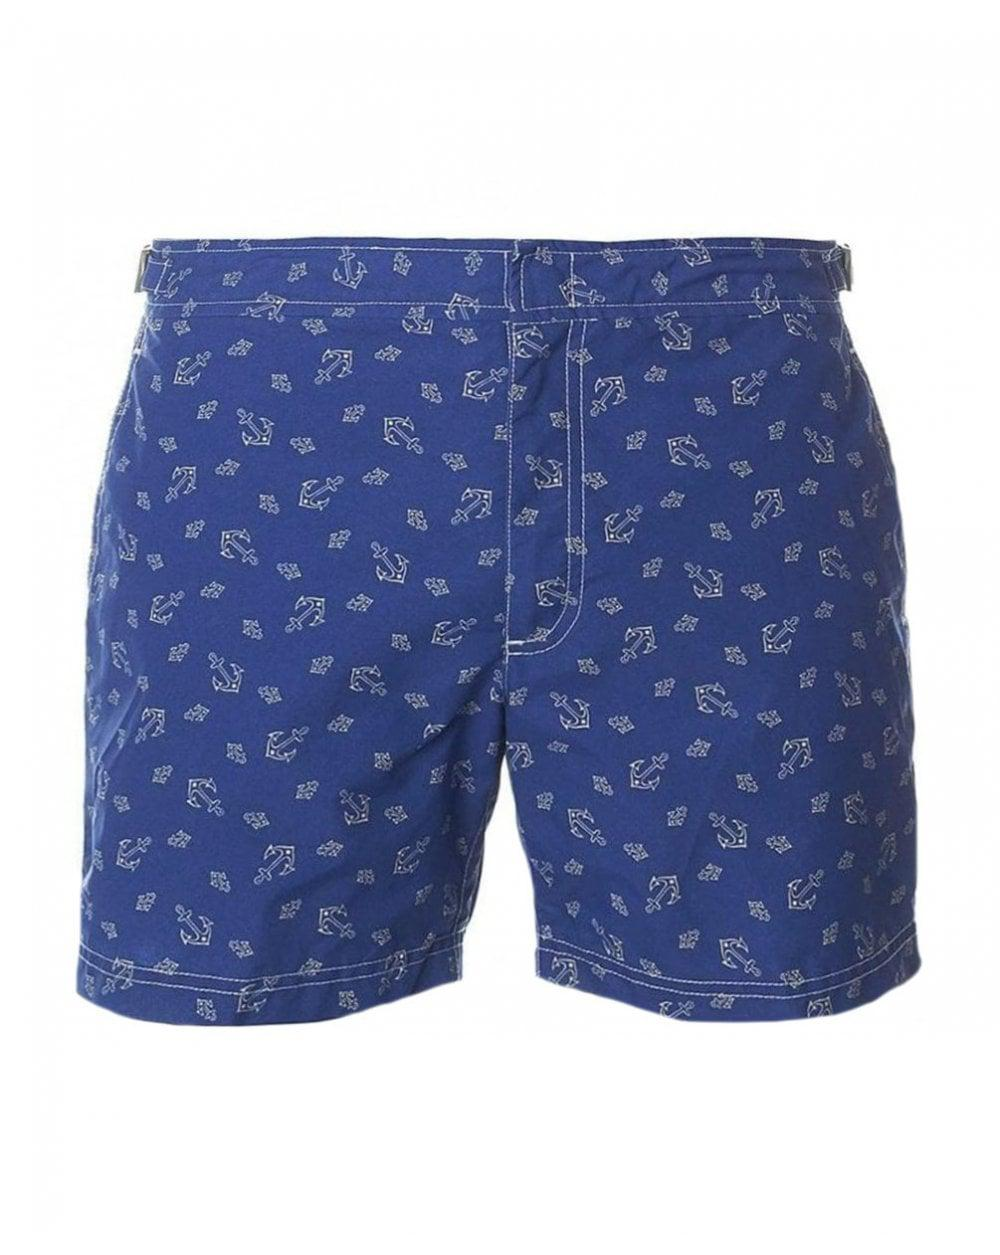 6b8e4da077e6e Polo Ralph Lauren Venice Anchor Print Swim Shorts in Blue for Men - Lyst